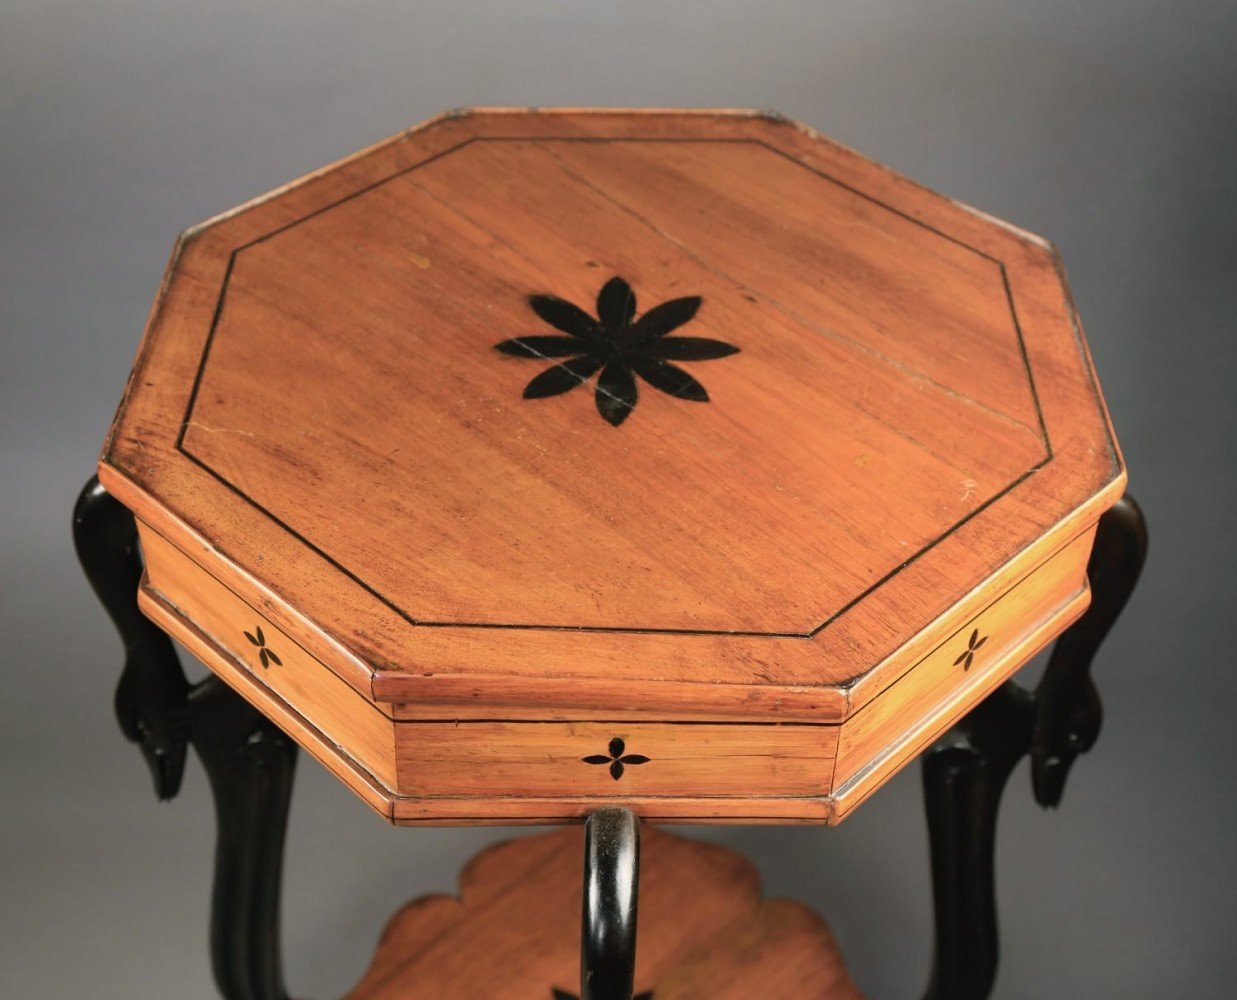 A Biedermeier Occasional Table, c.1810